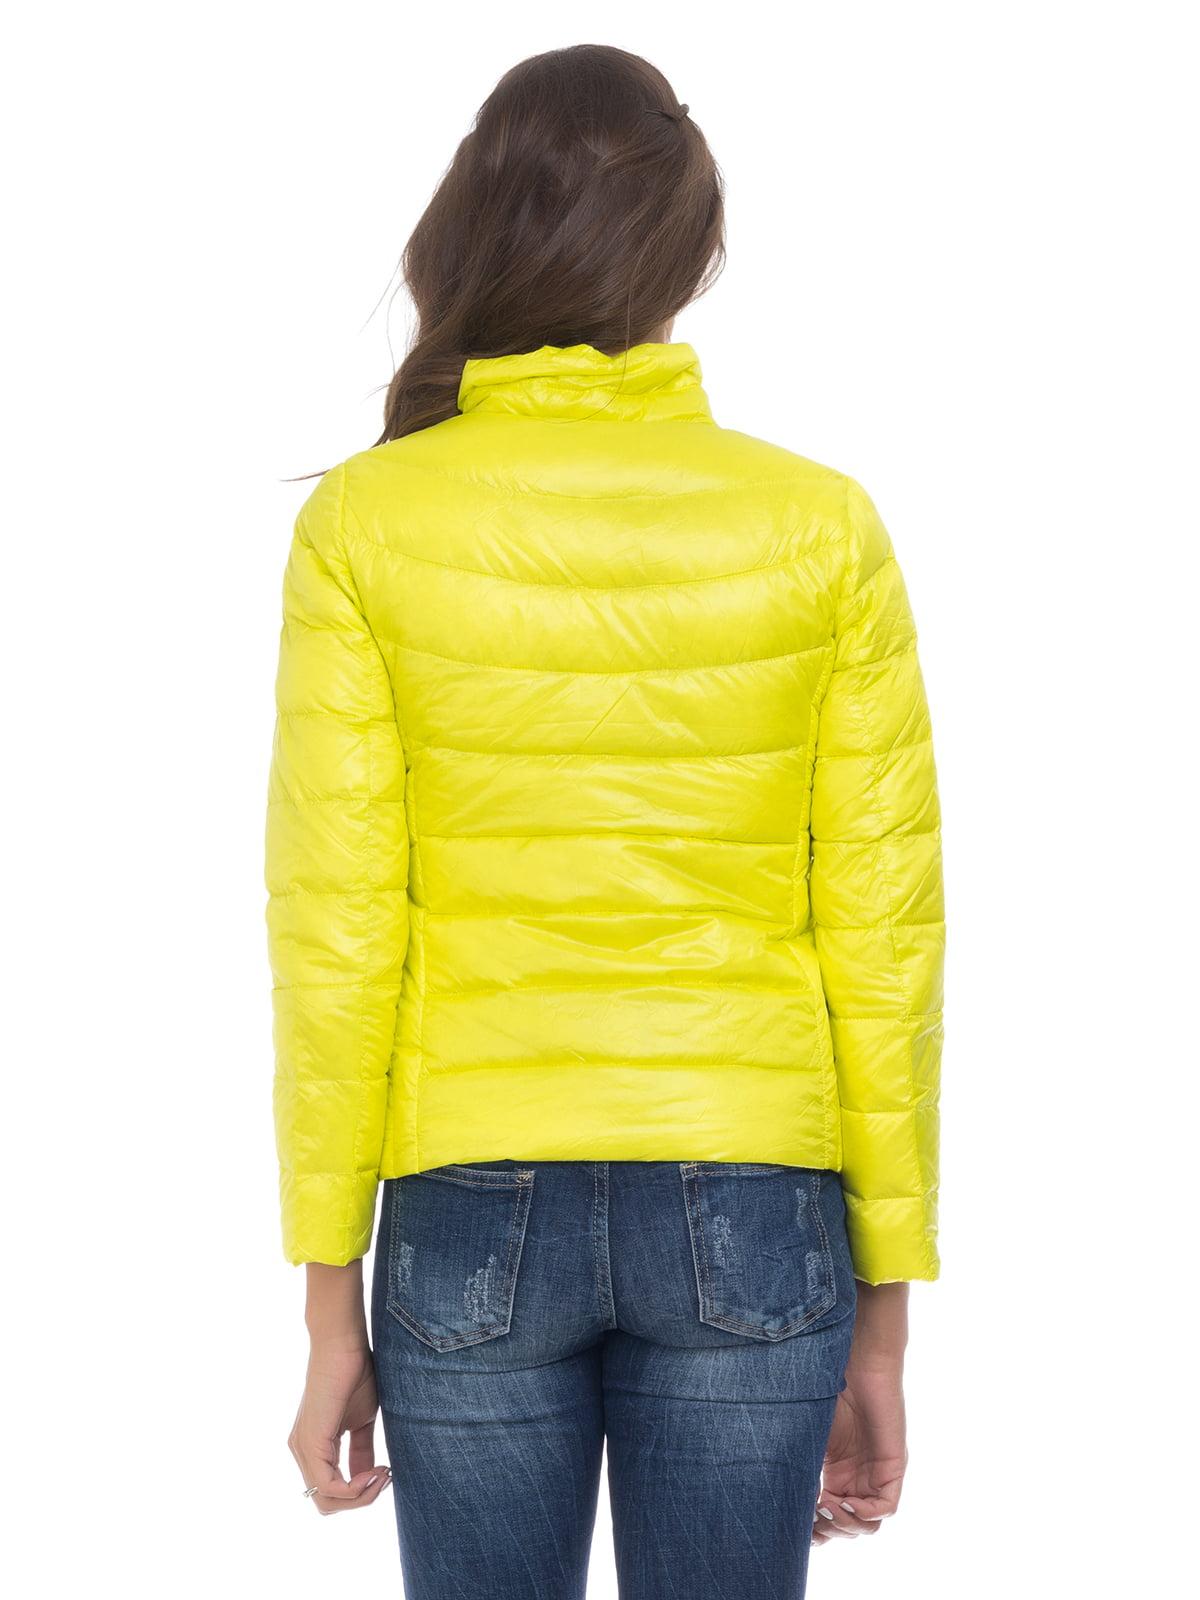 Куртка лимонного цвета   4525915   фото 2